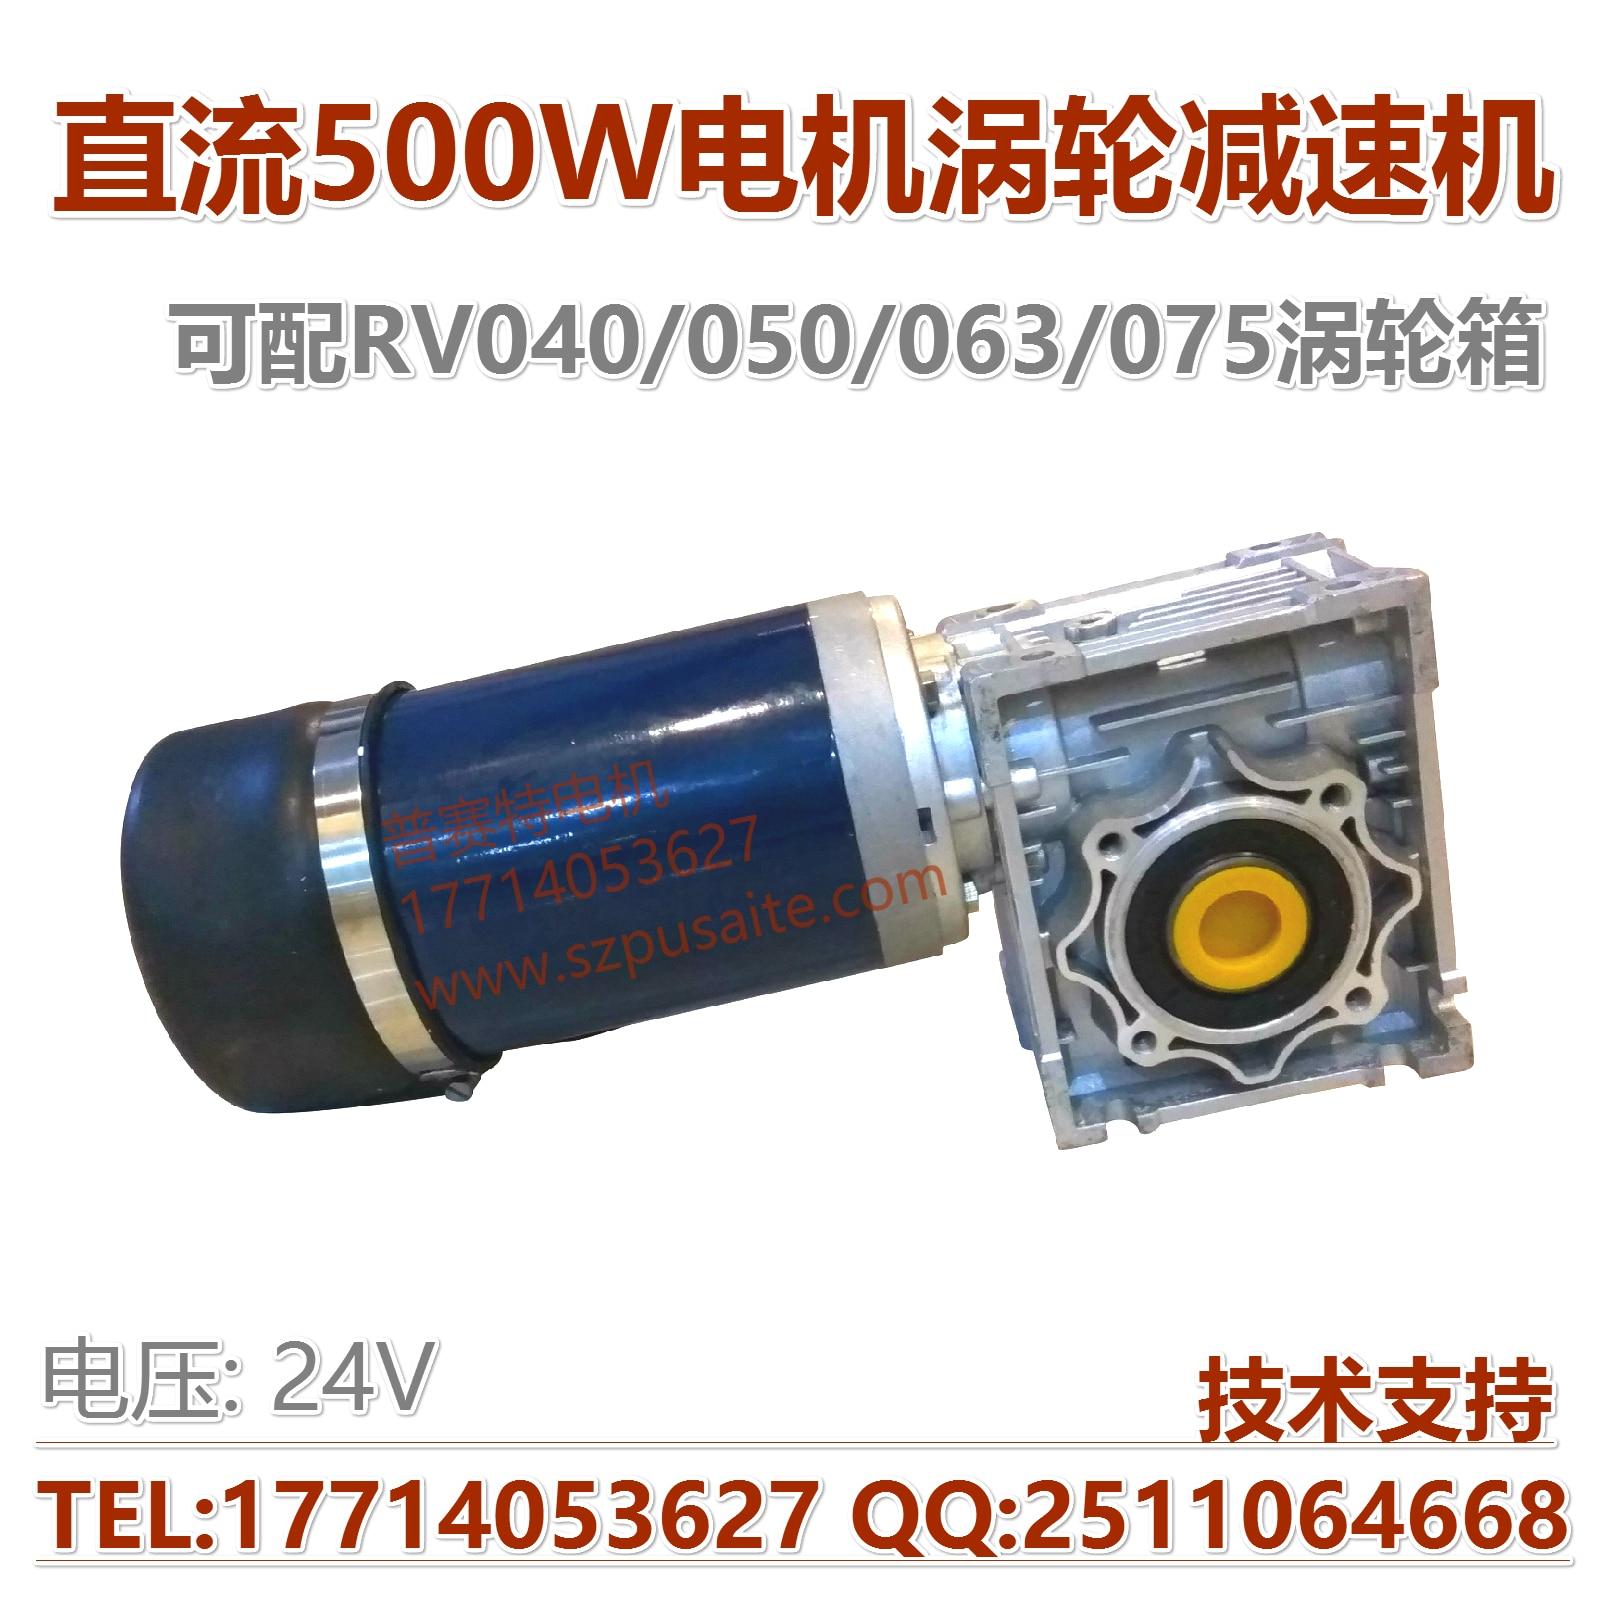 25BB508 40BC02JDD 3011952-3 605831R91 829938R91 662060R91 112041R91 Ball Bearing